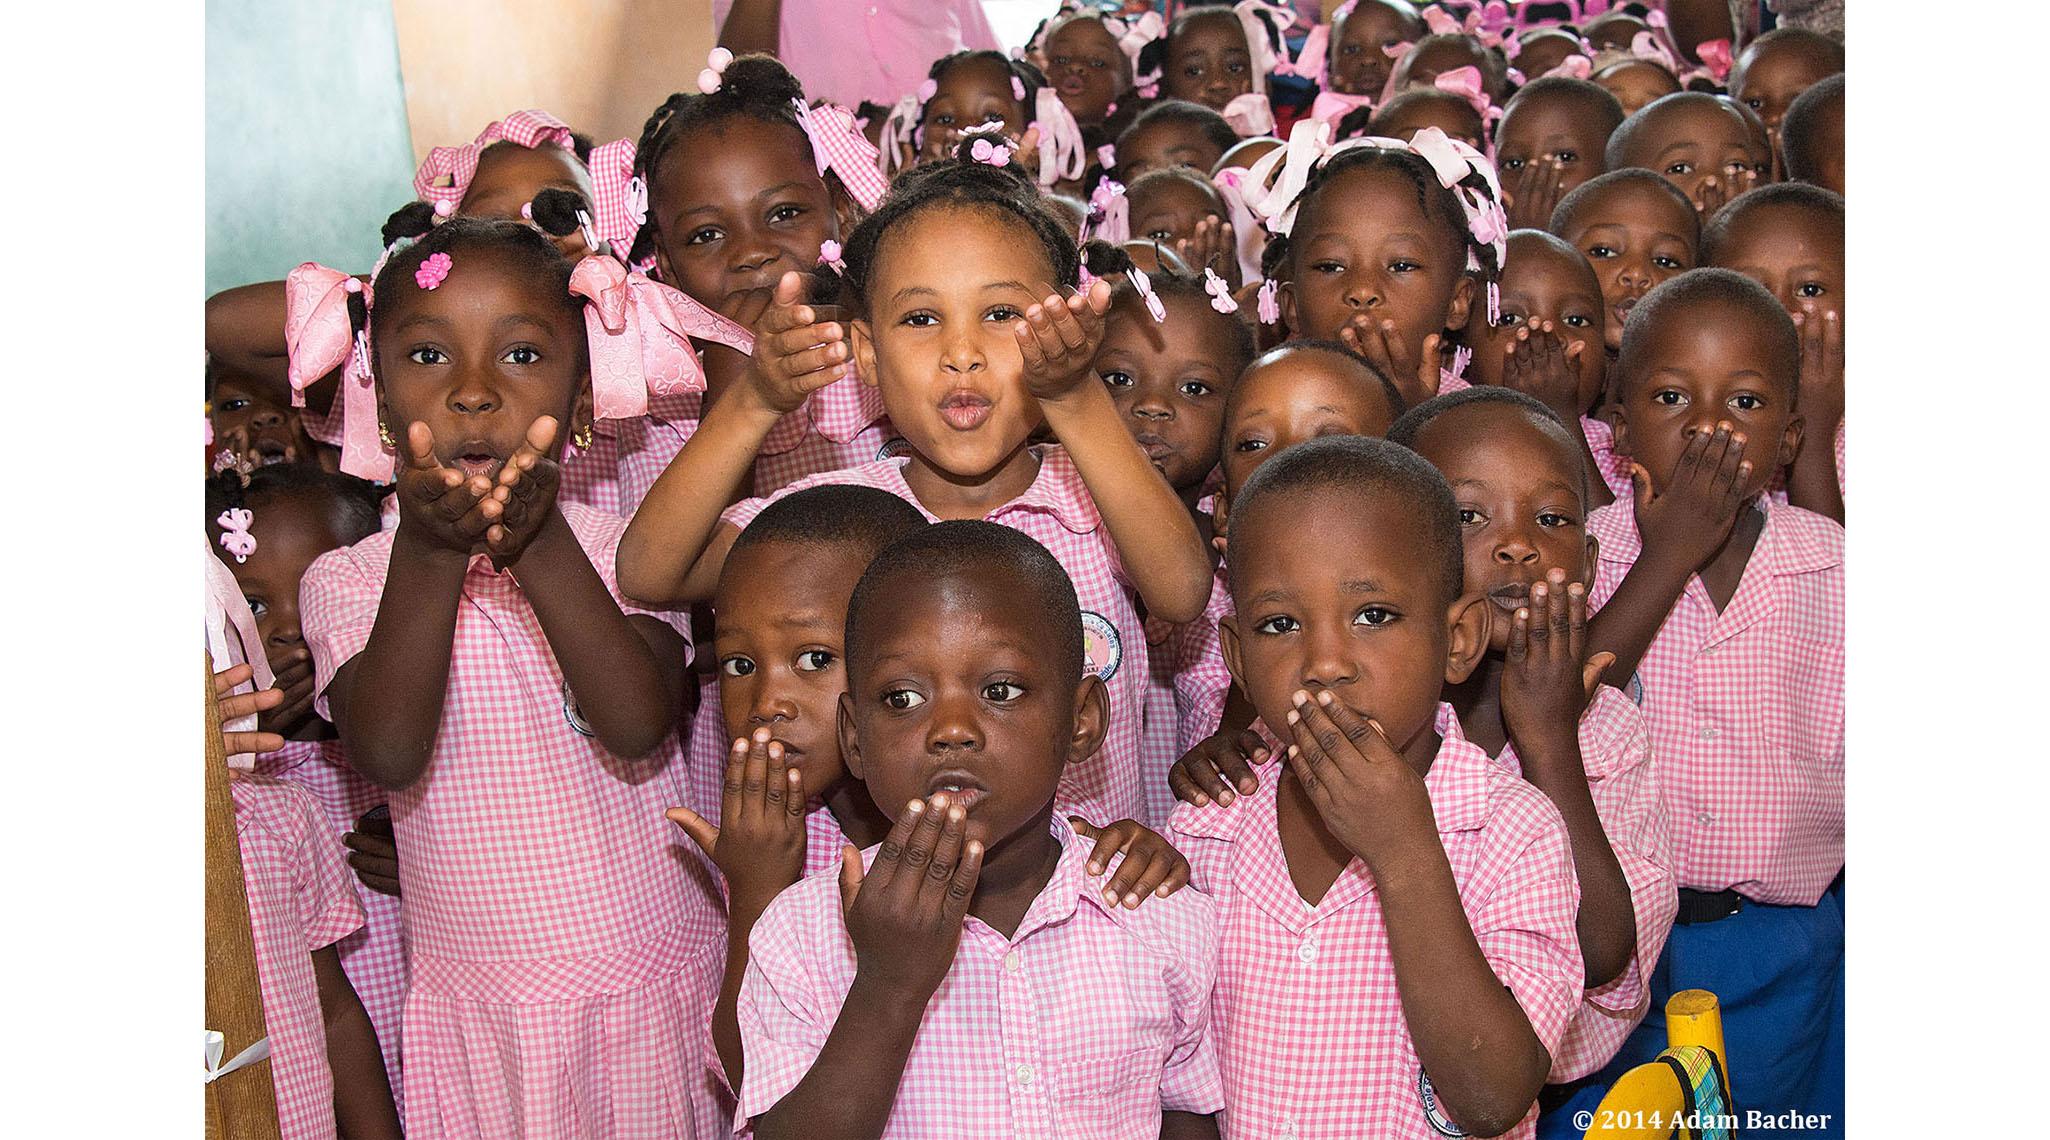 Why go to Haiti?